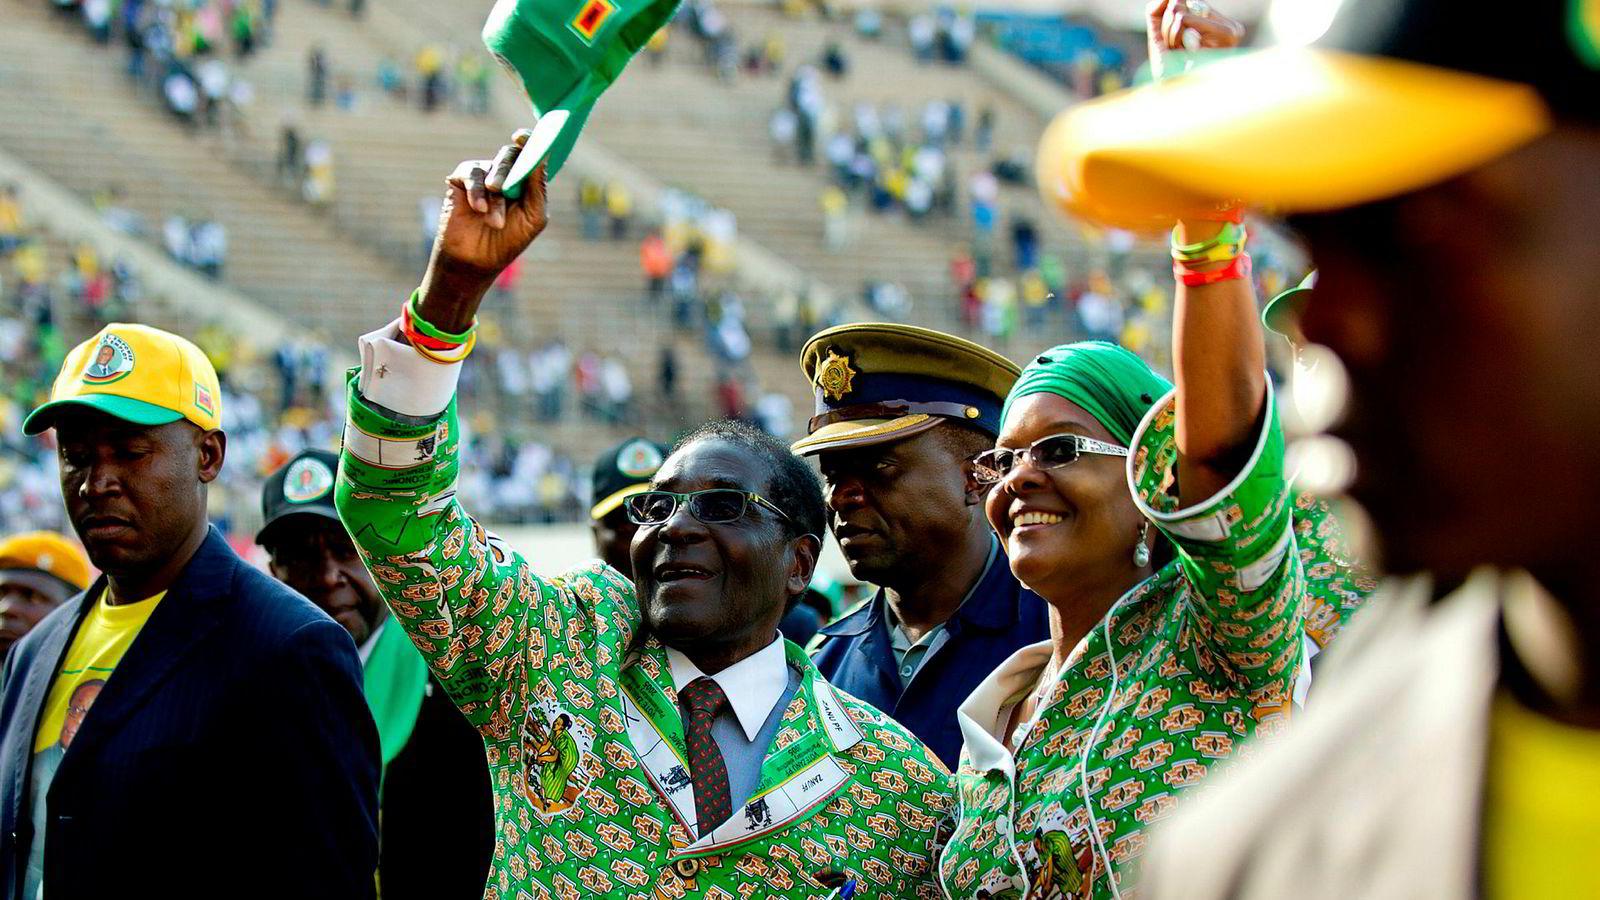 Daværende president Robert Mugabe under et valgmøte i 2013 sammen med sin kone. Mugabe styrte Zimbabwe med jernhånd fra 1980 til 2017.